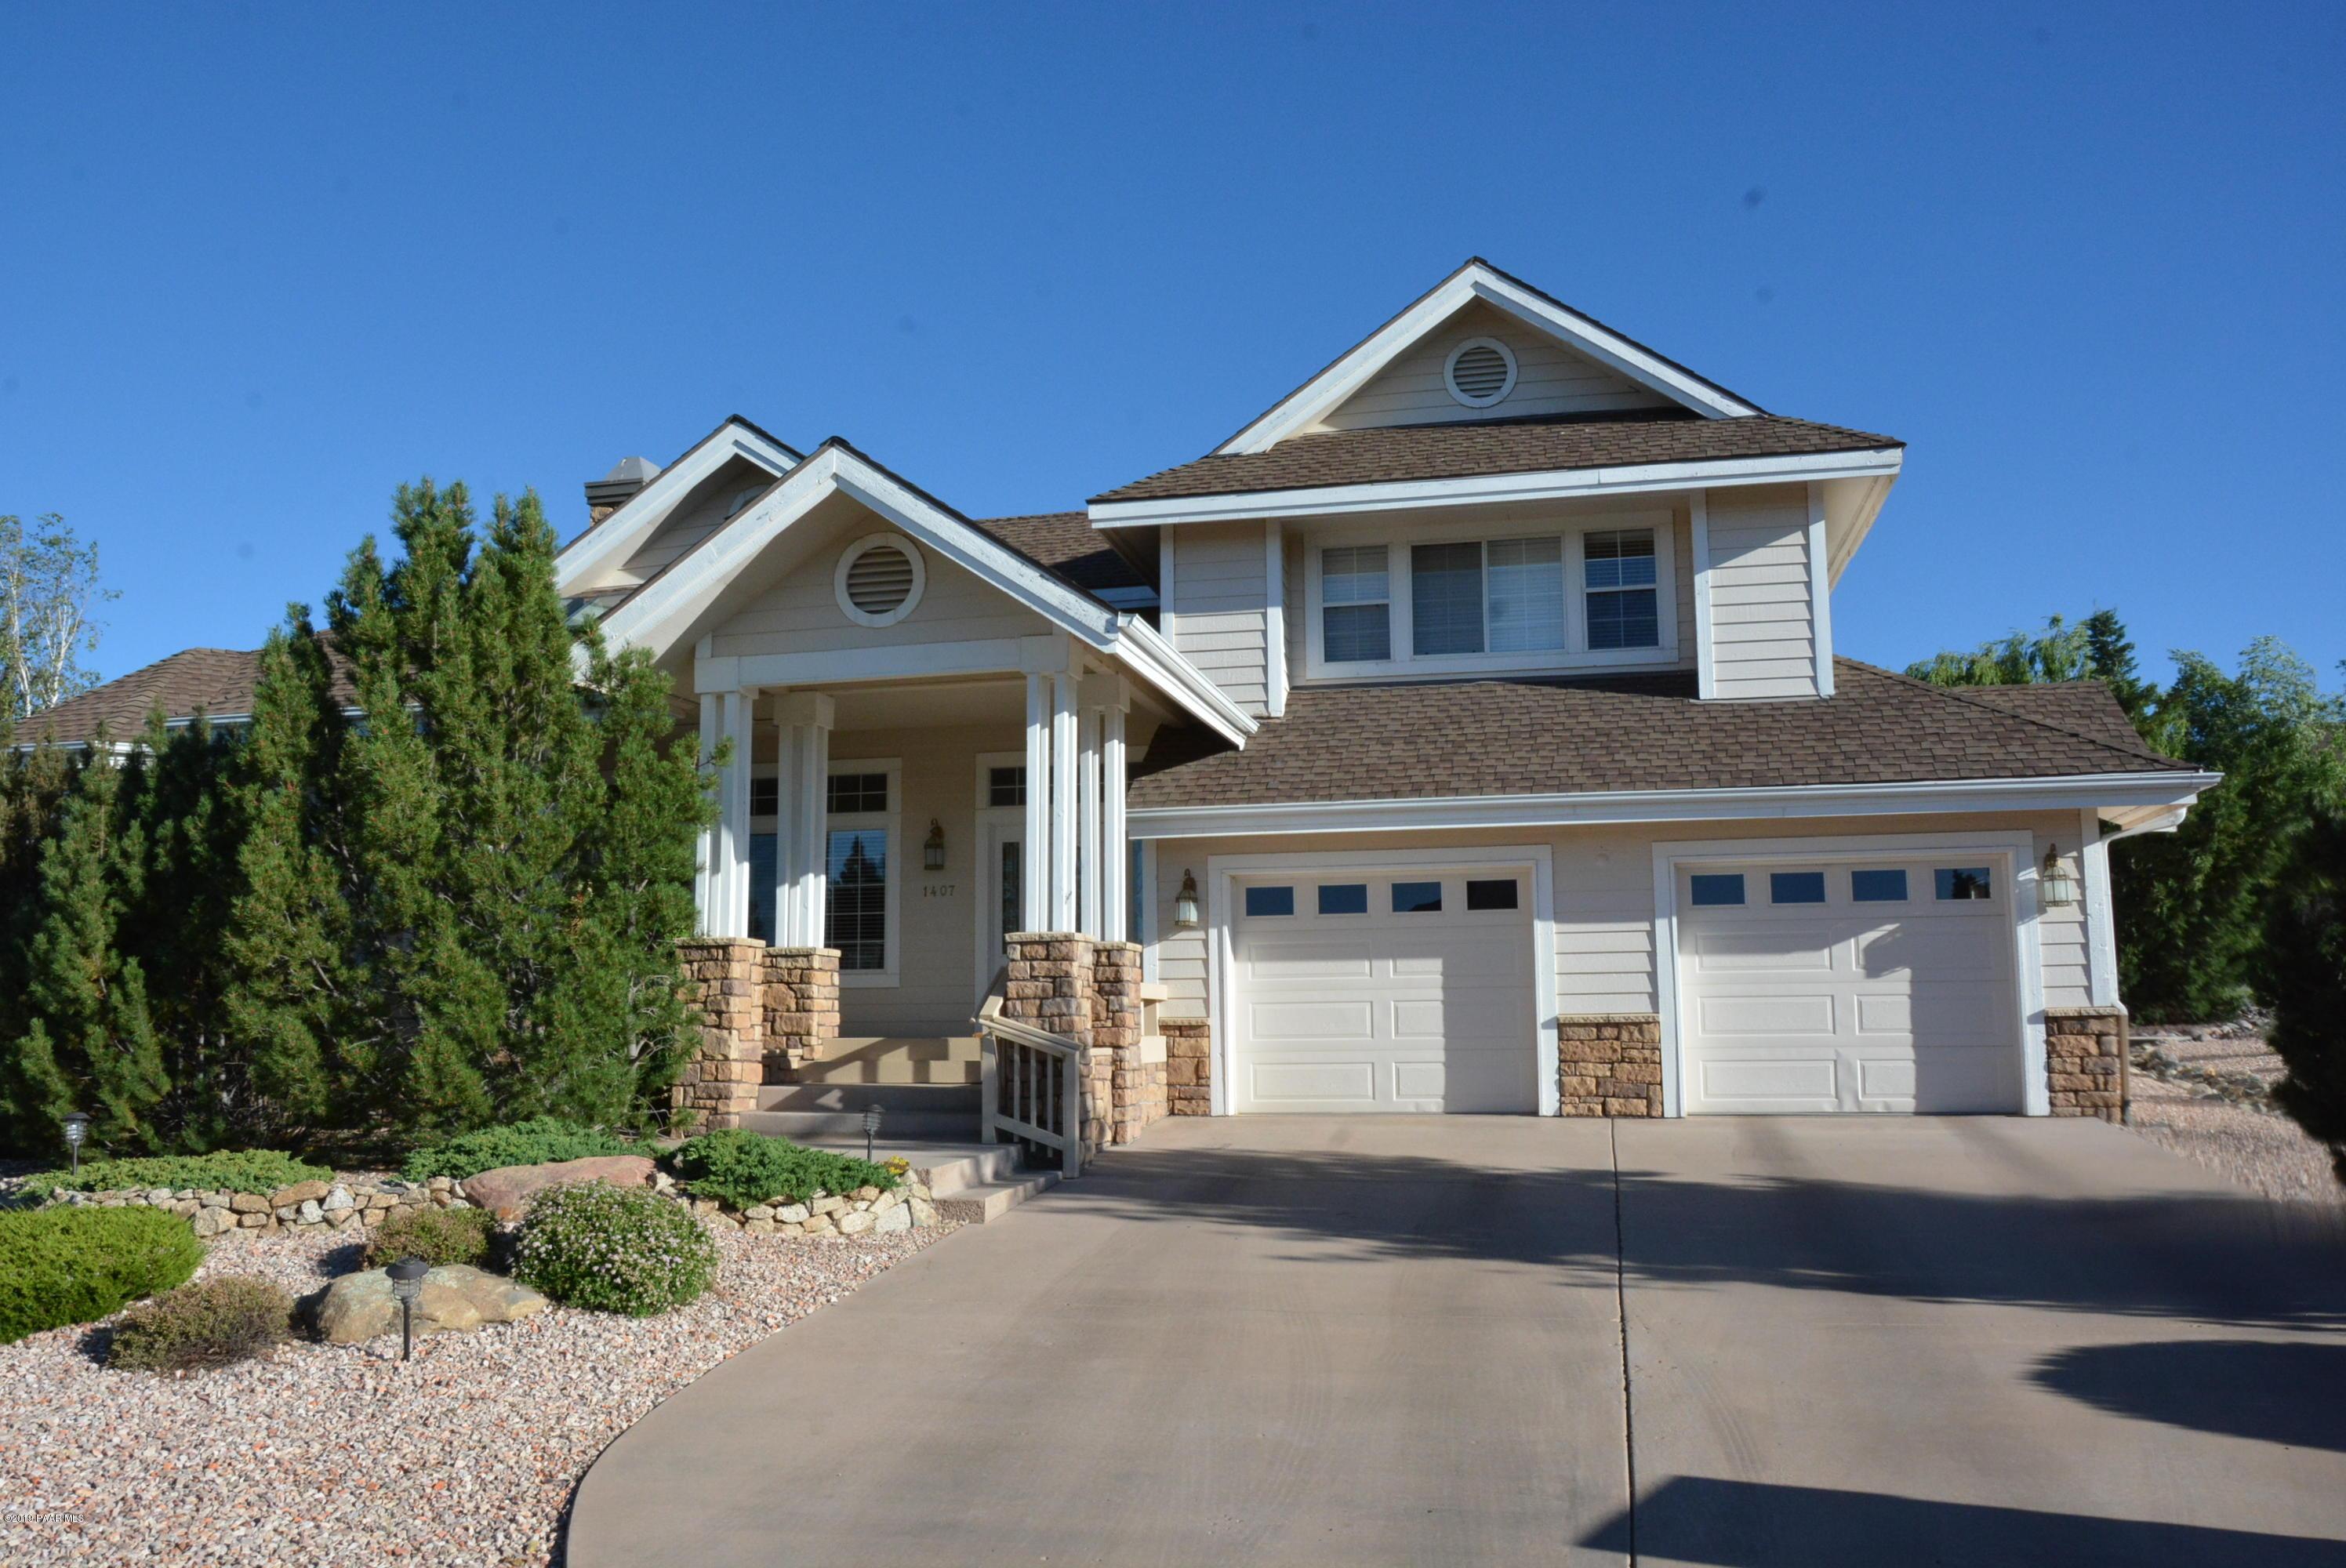 Photo of 1407 Claiborne, Prescott, AZ 86301